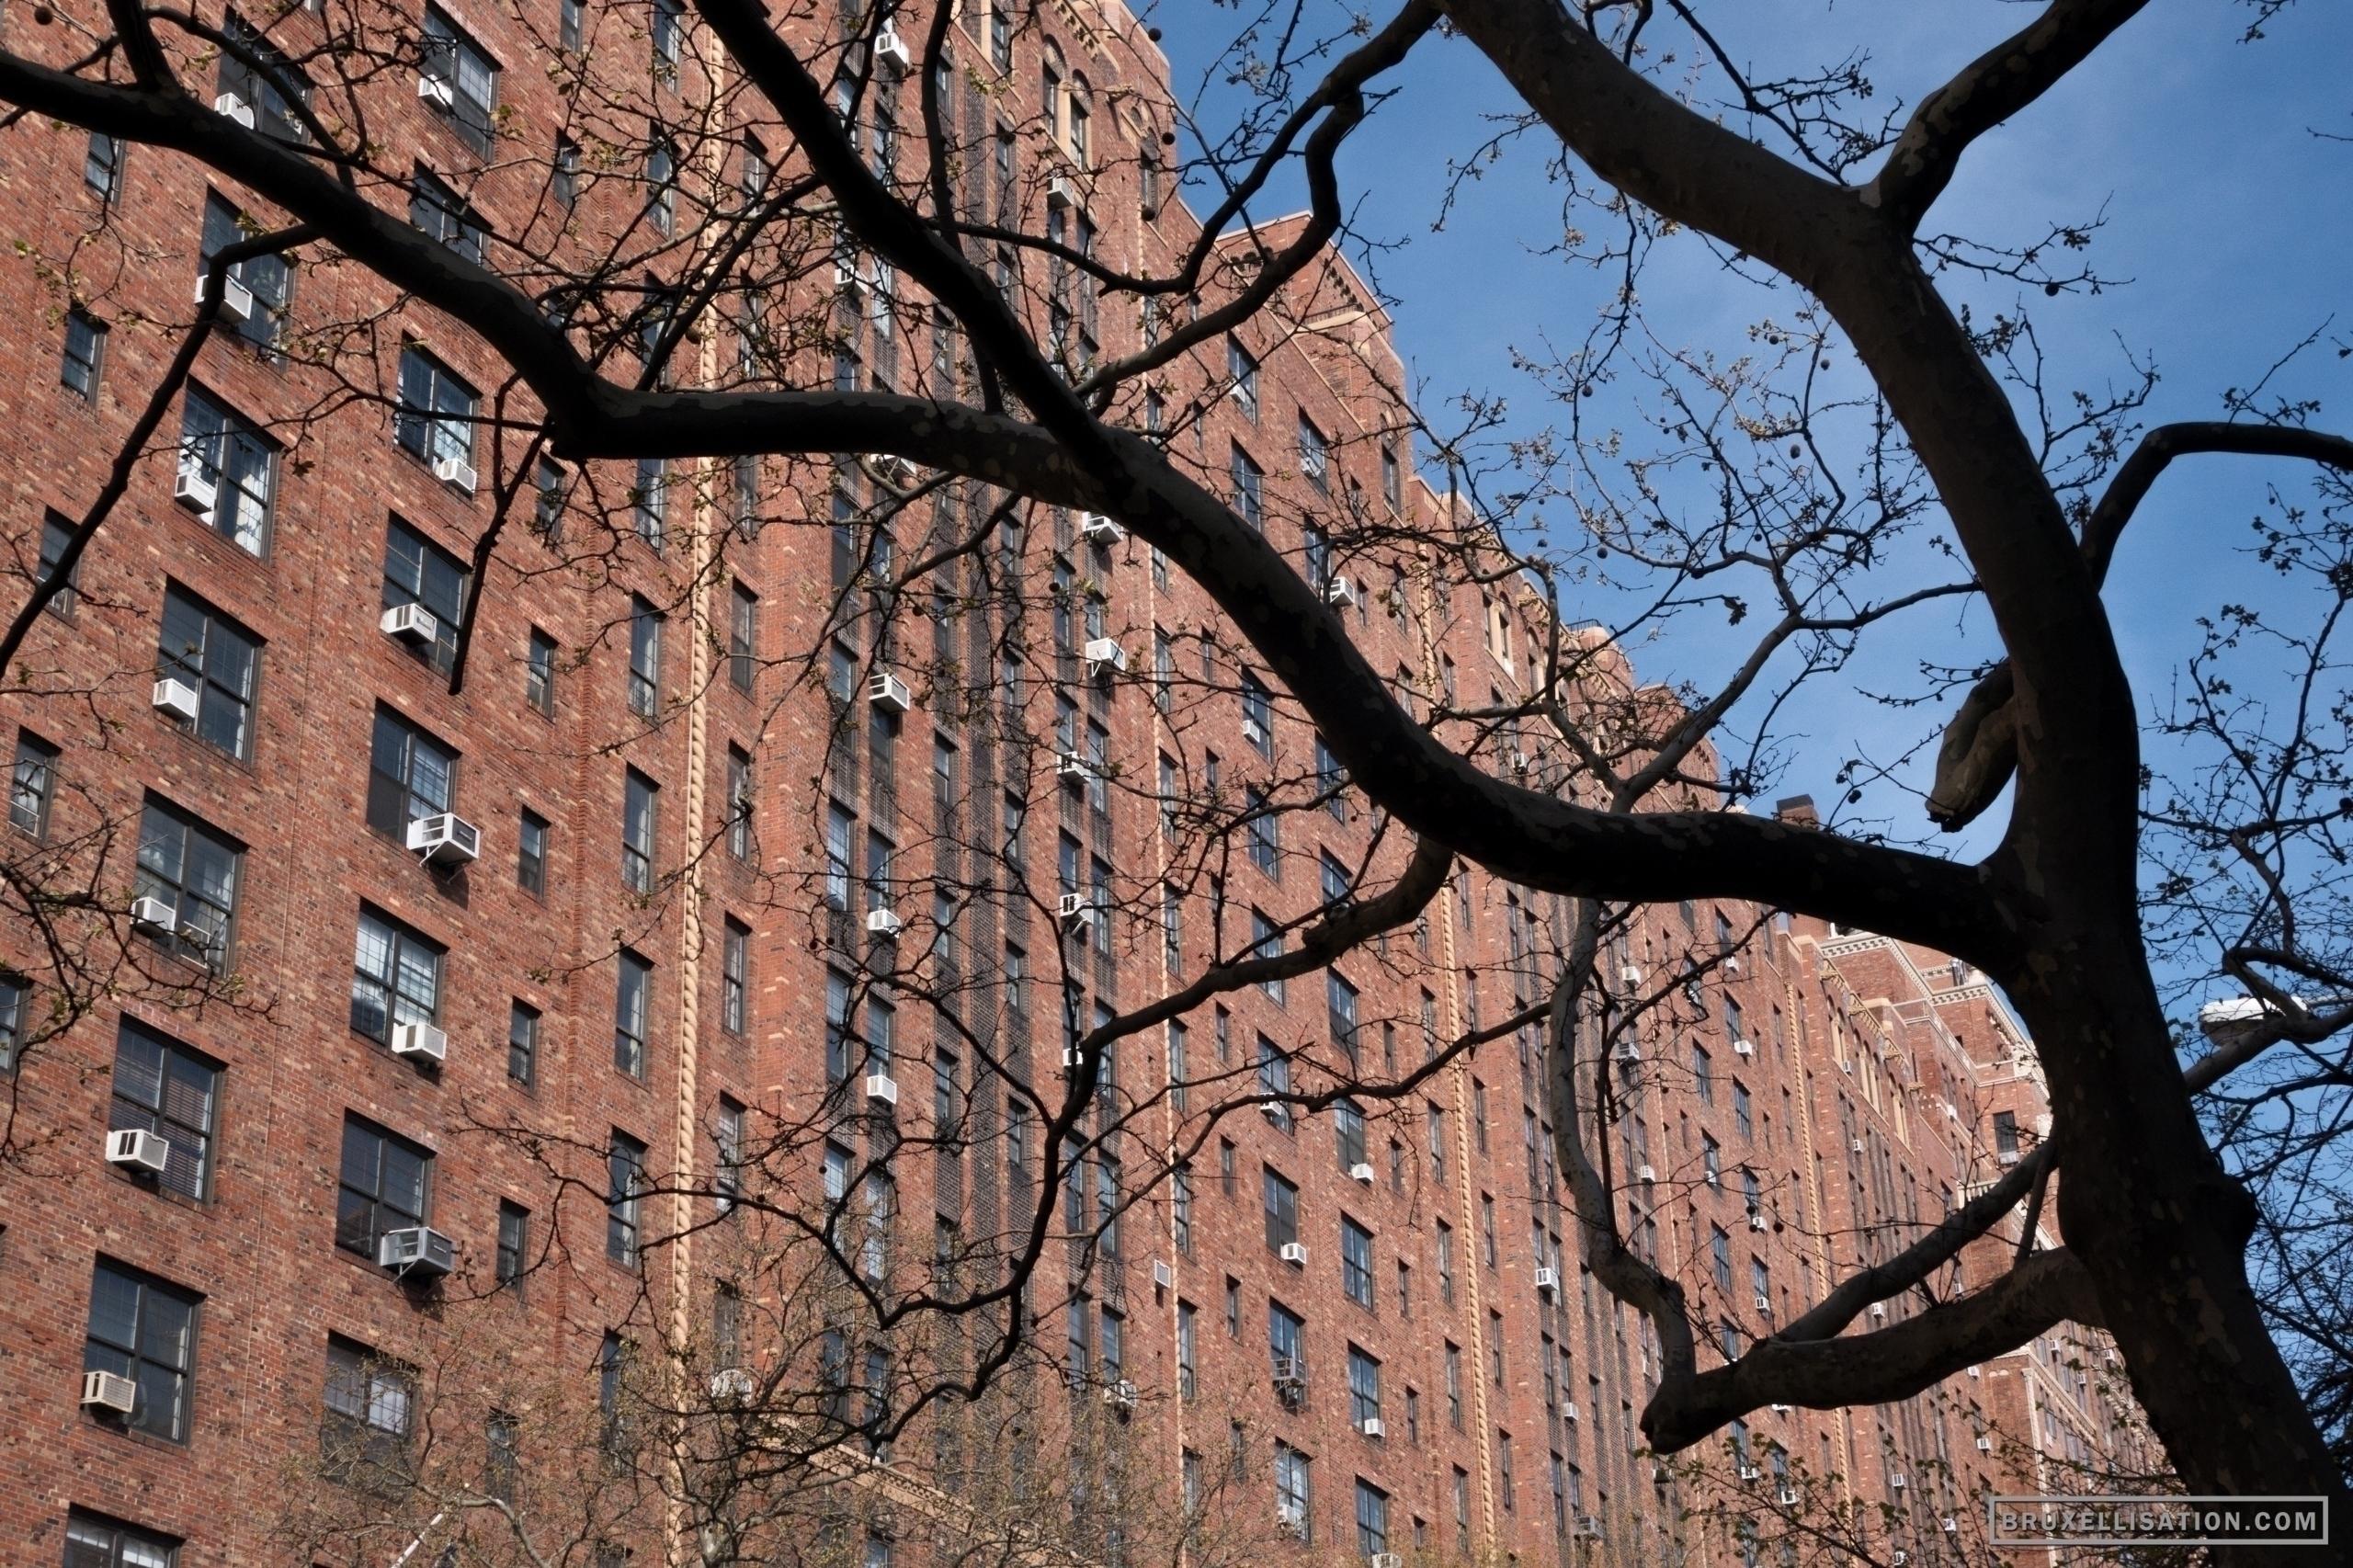 USA, York, April 2014 - streetphotography - bruxellisation | ello